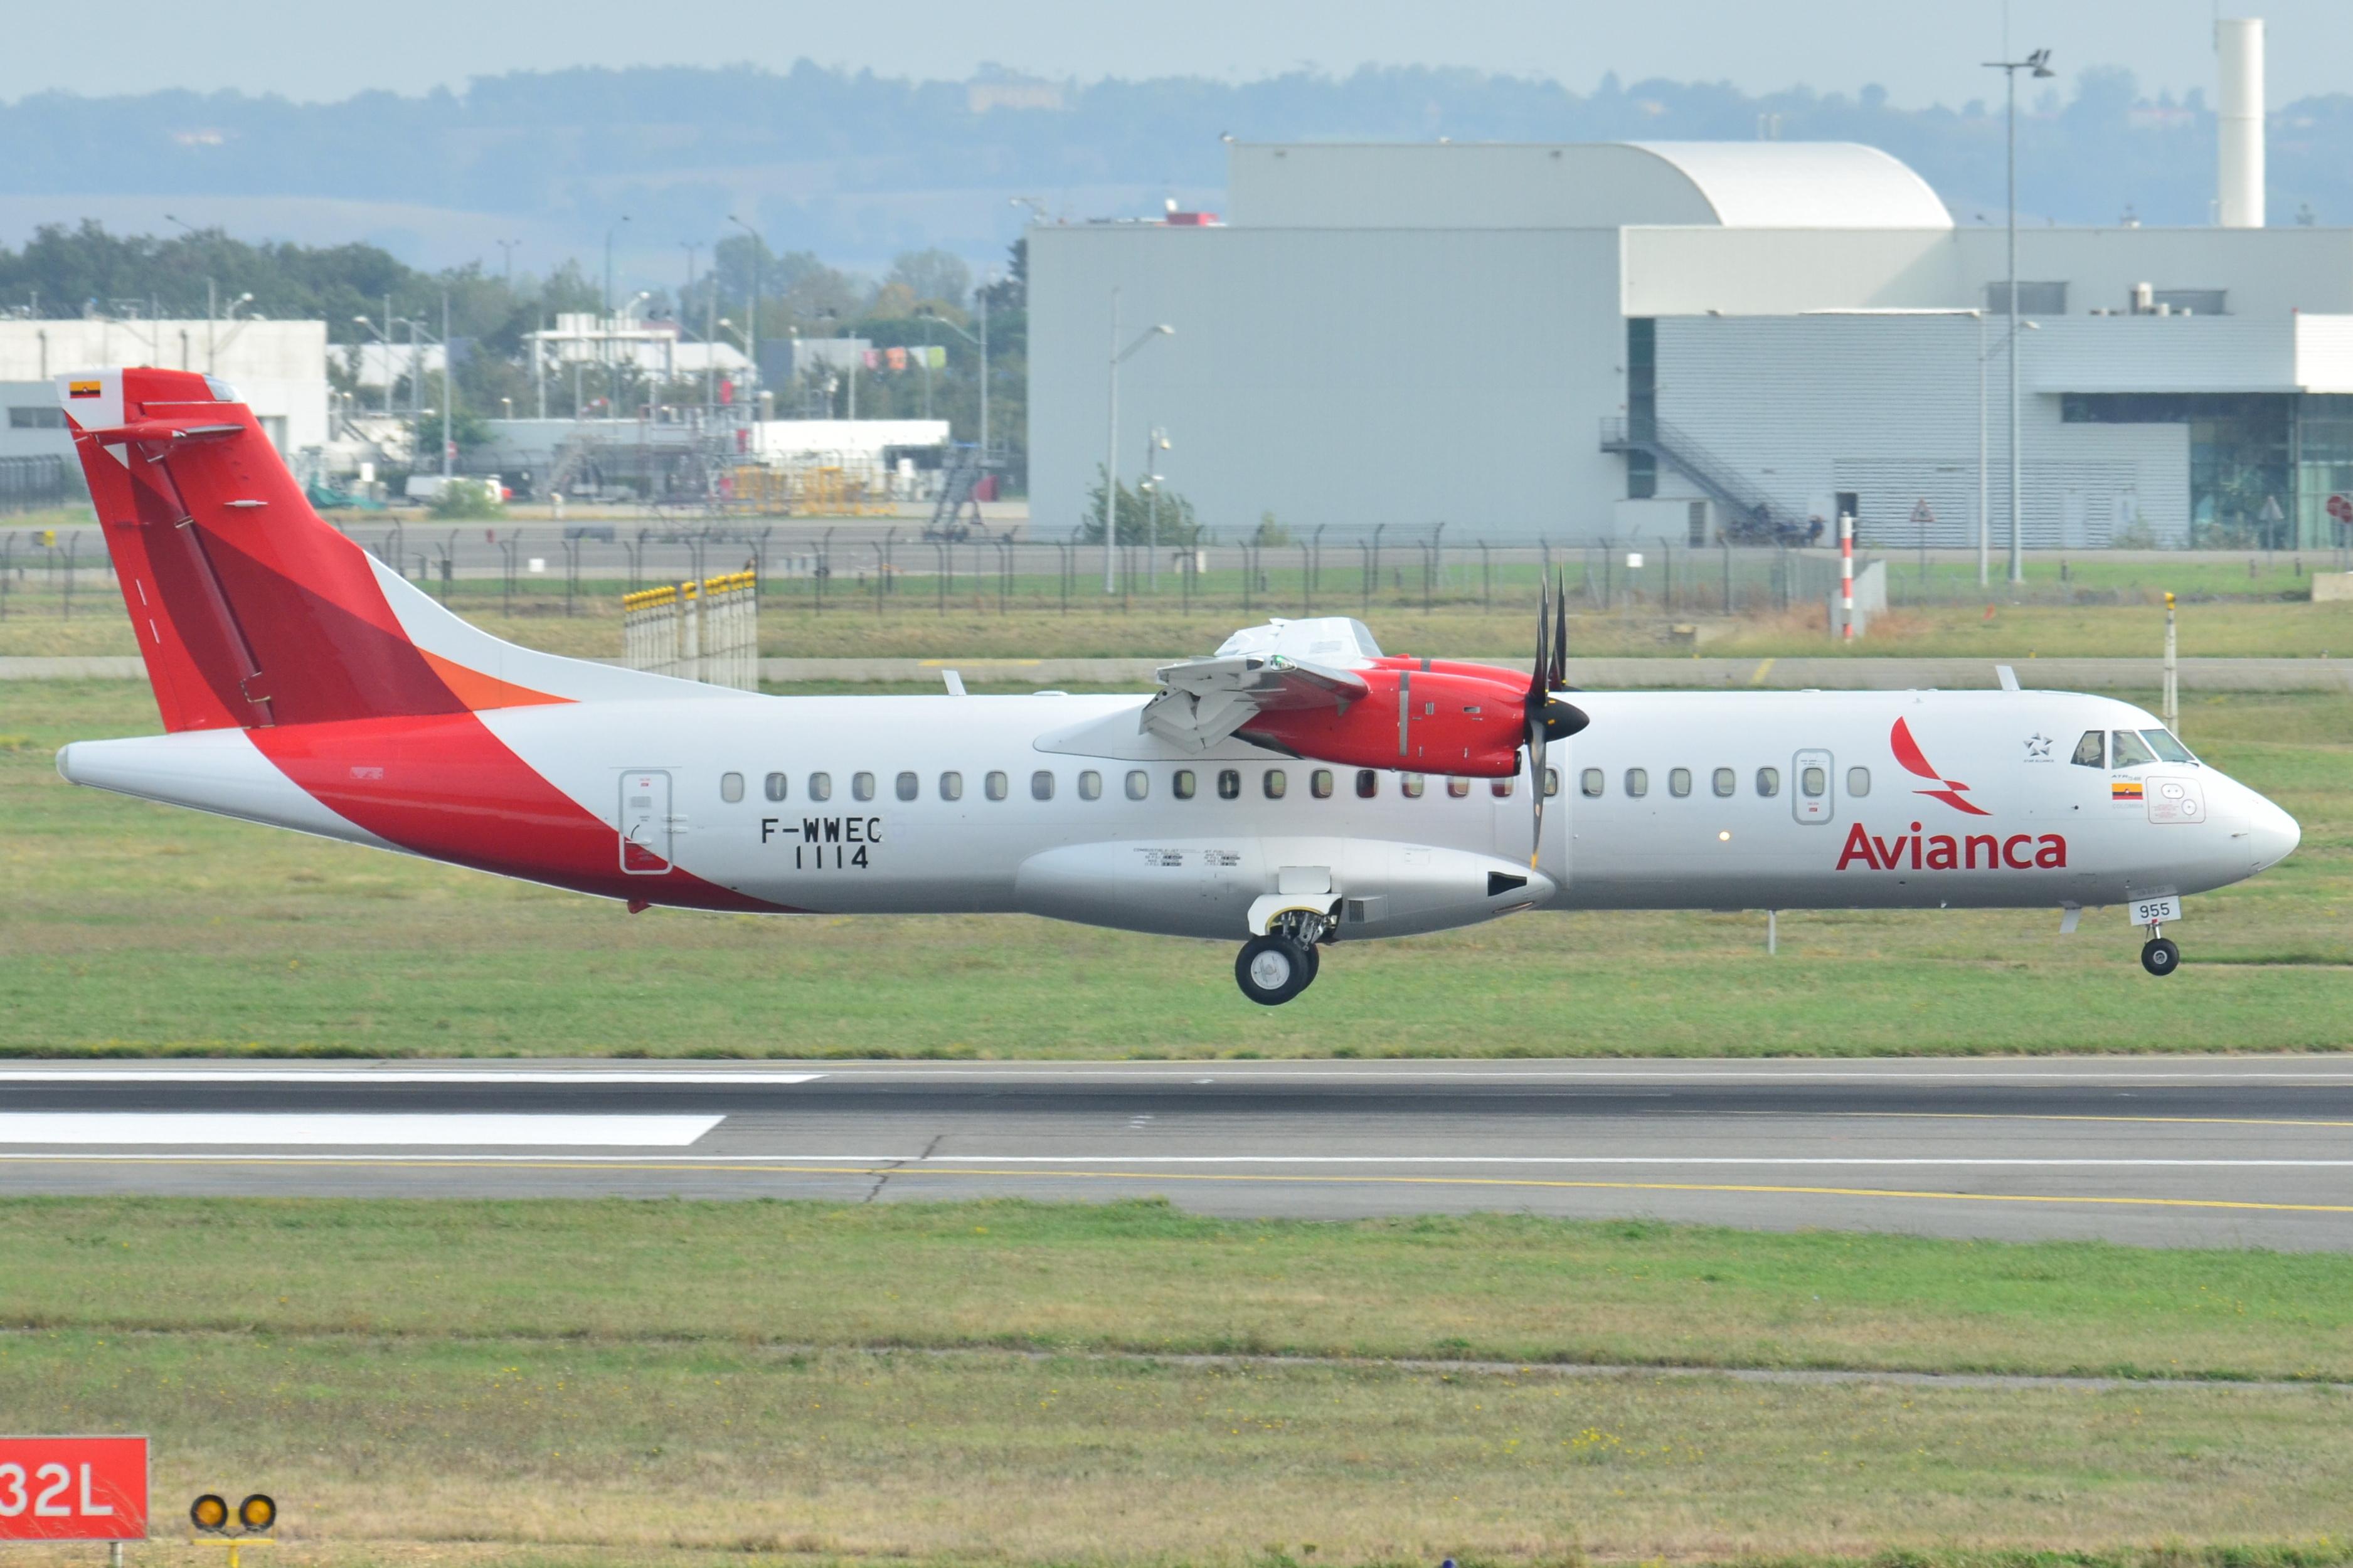 ATR_72-600_Avianca_(AVA)_F-WWEC_-_MSN_1114_-_Will_be_HK-4955_(10498384486)